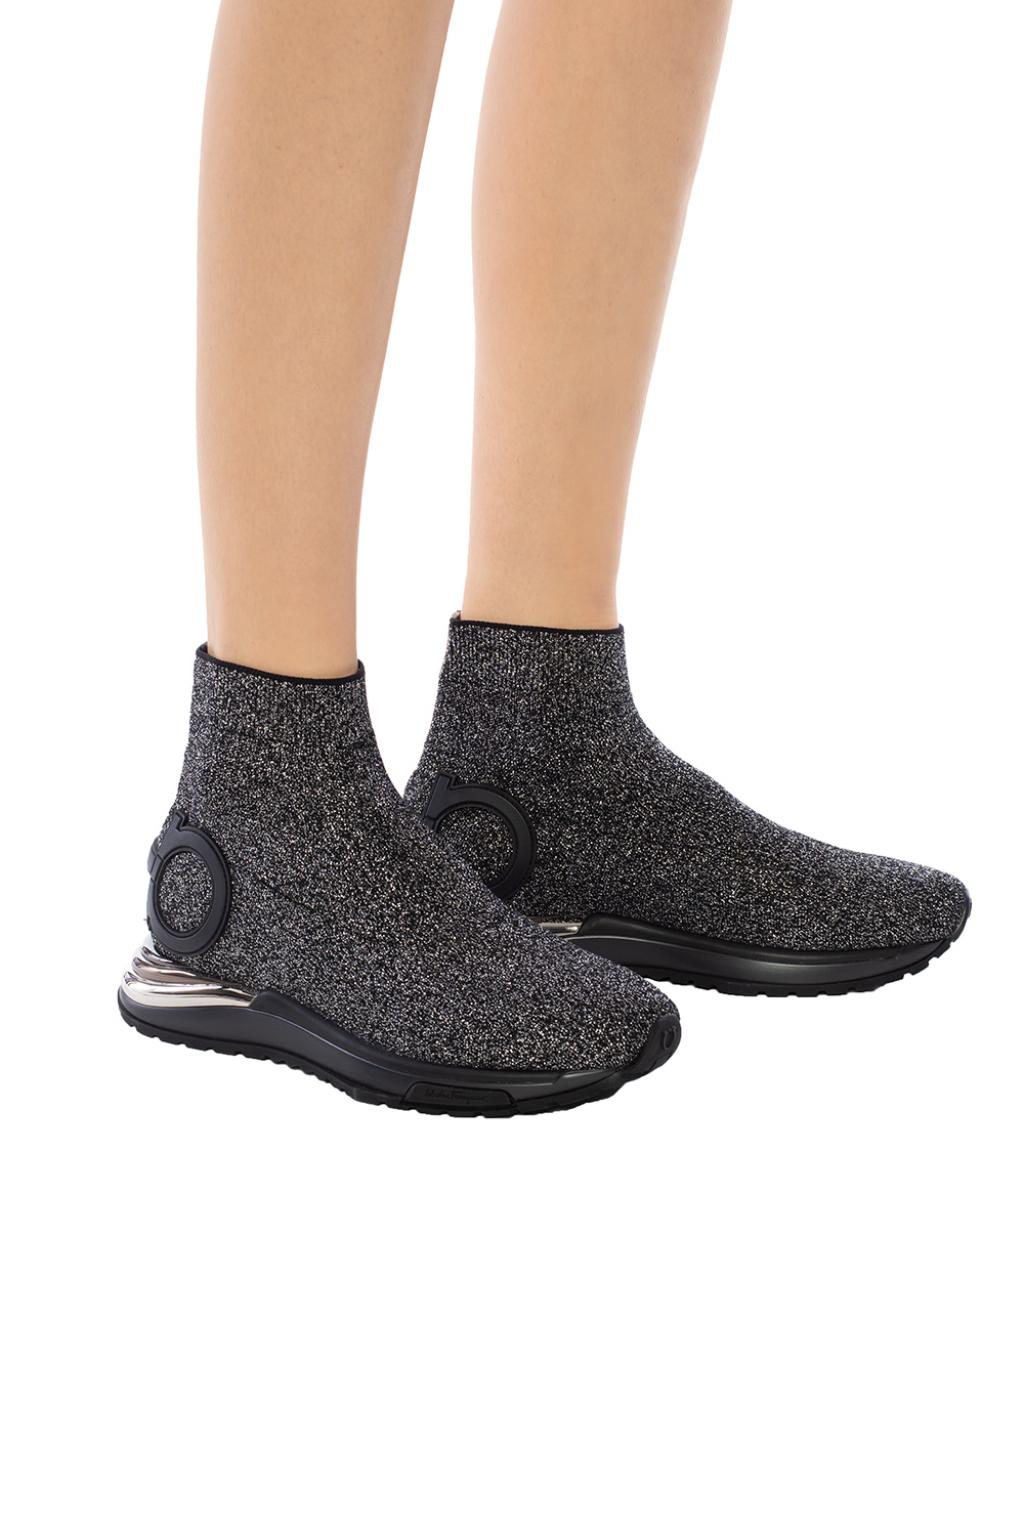 Salvatore Ferragamo 'Gardena' sock sneakers